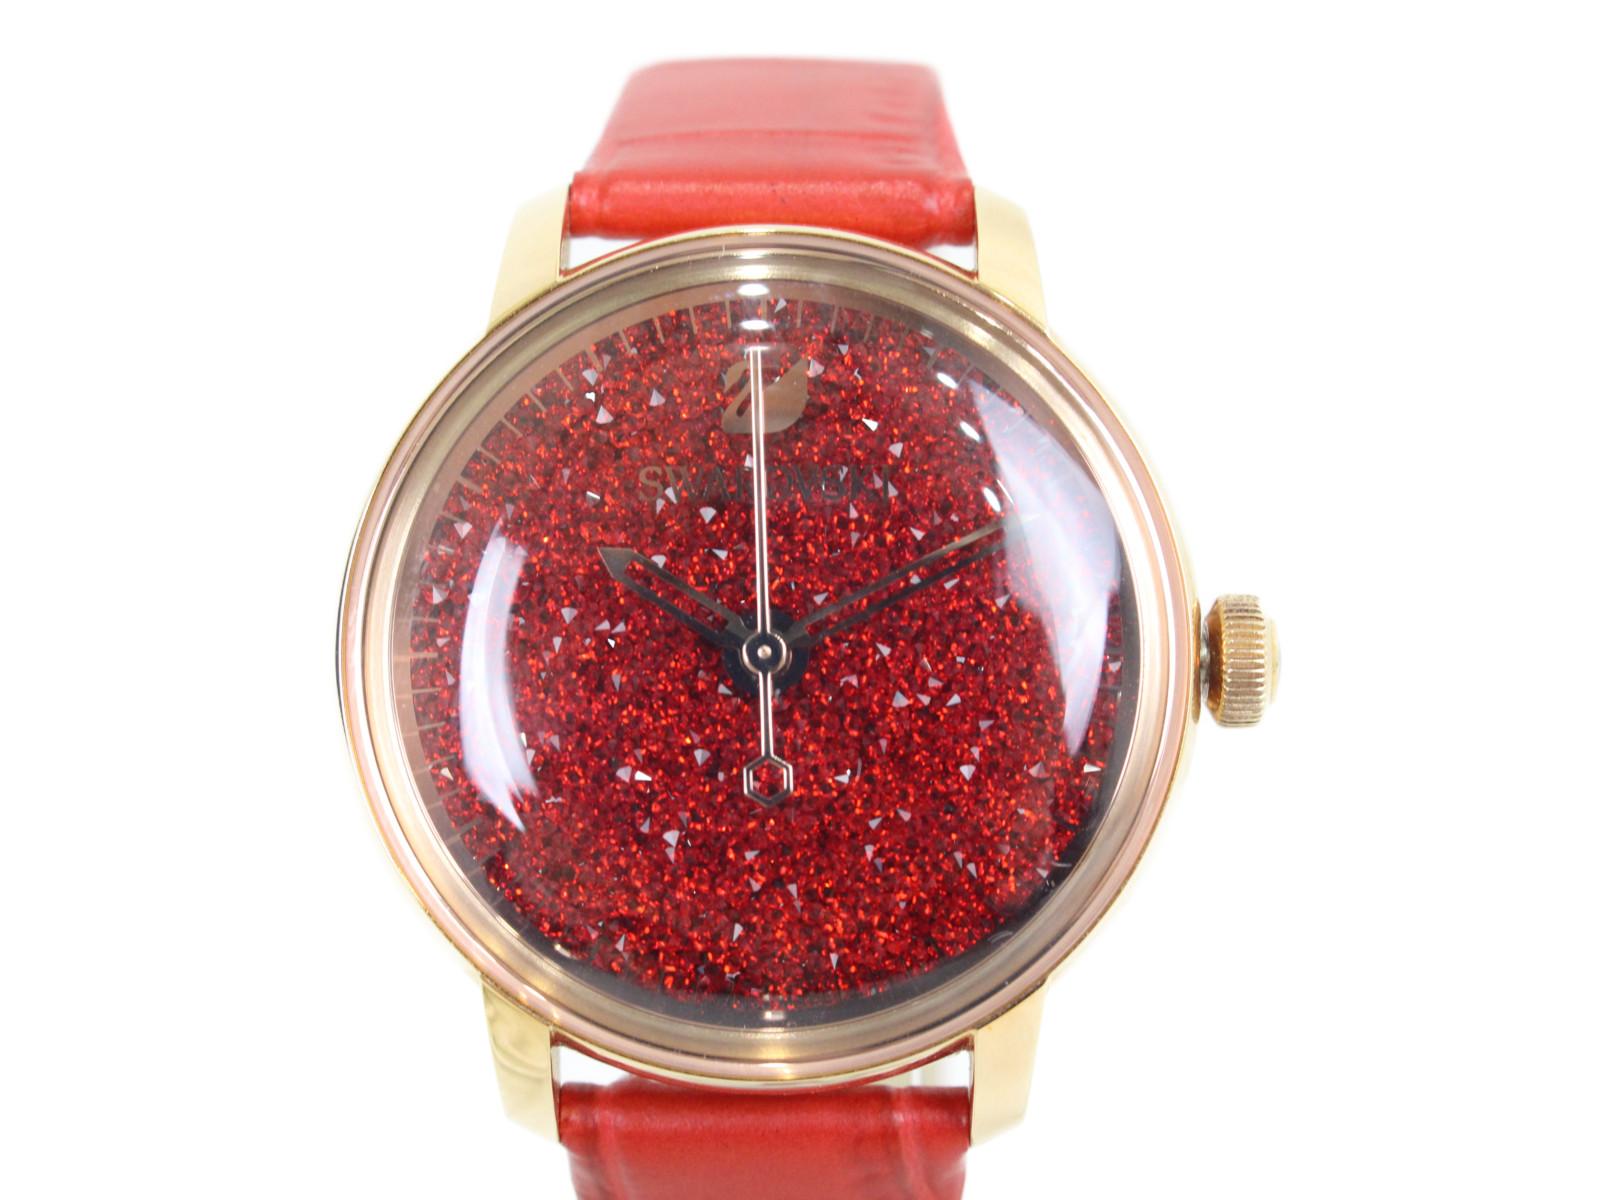 SWAROVSKI スワロフスキー Cristalline Hours ウォッチ 腕時計 5295380 クオーツ レッド ステンレススチール レザー レディース 【中古】